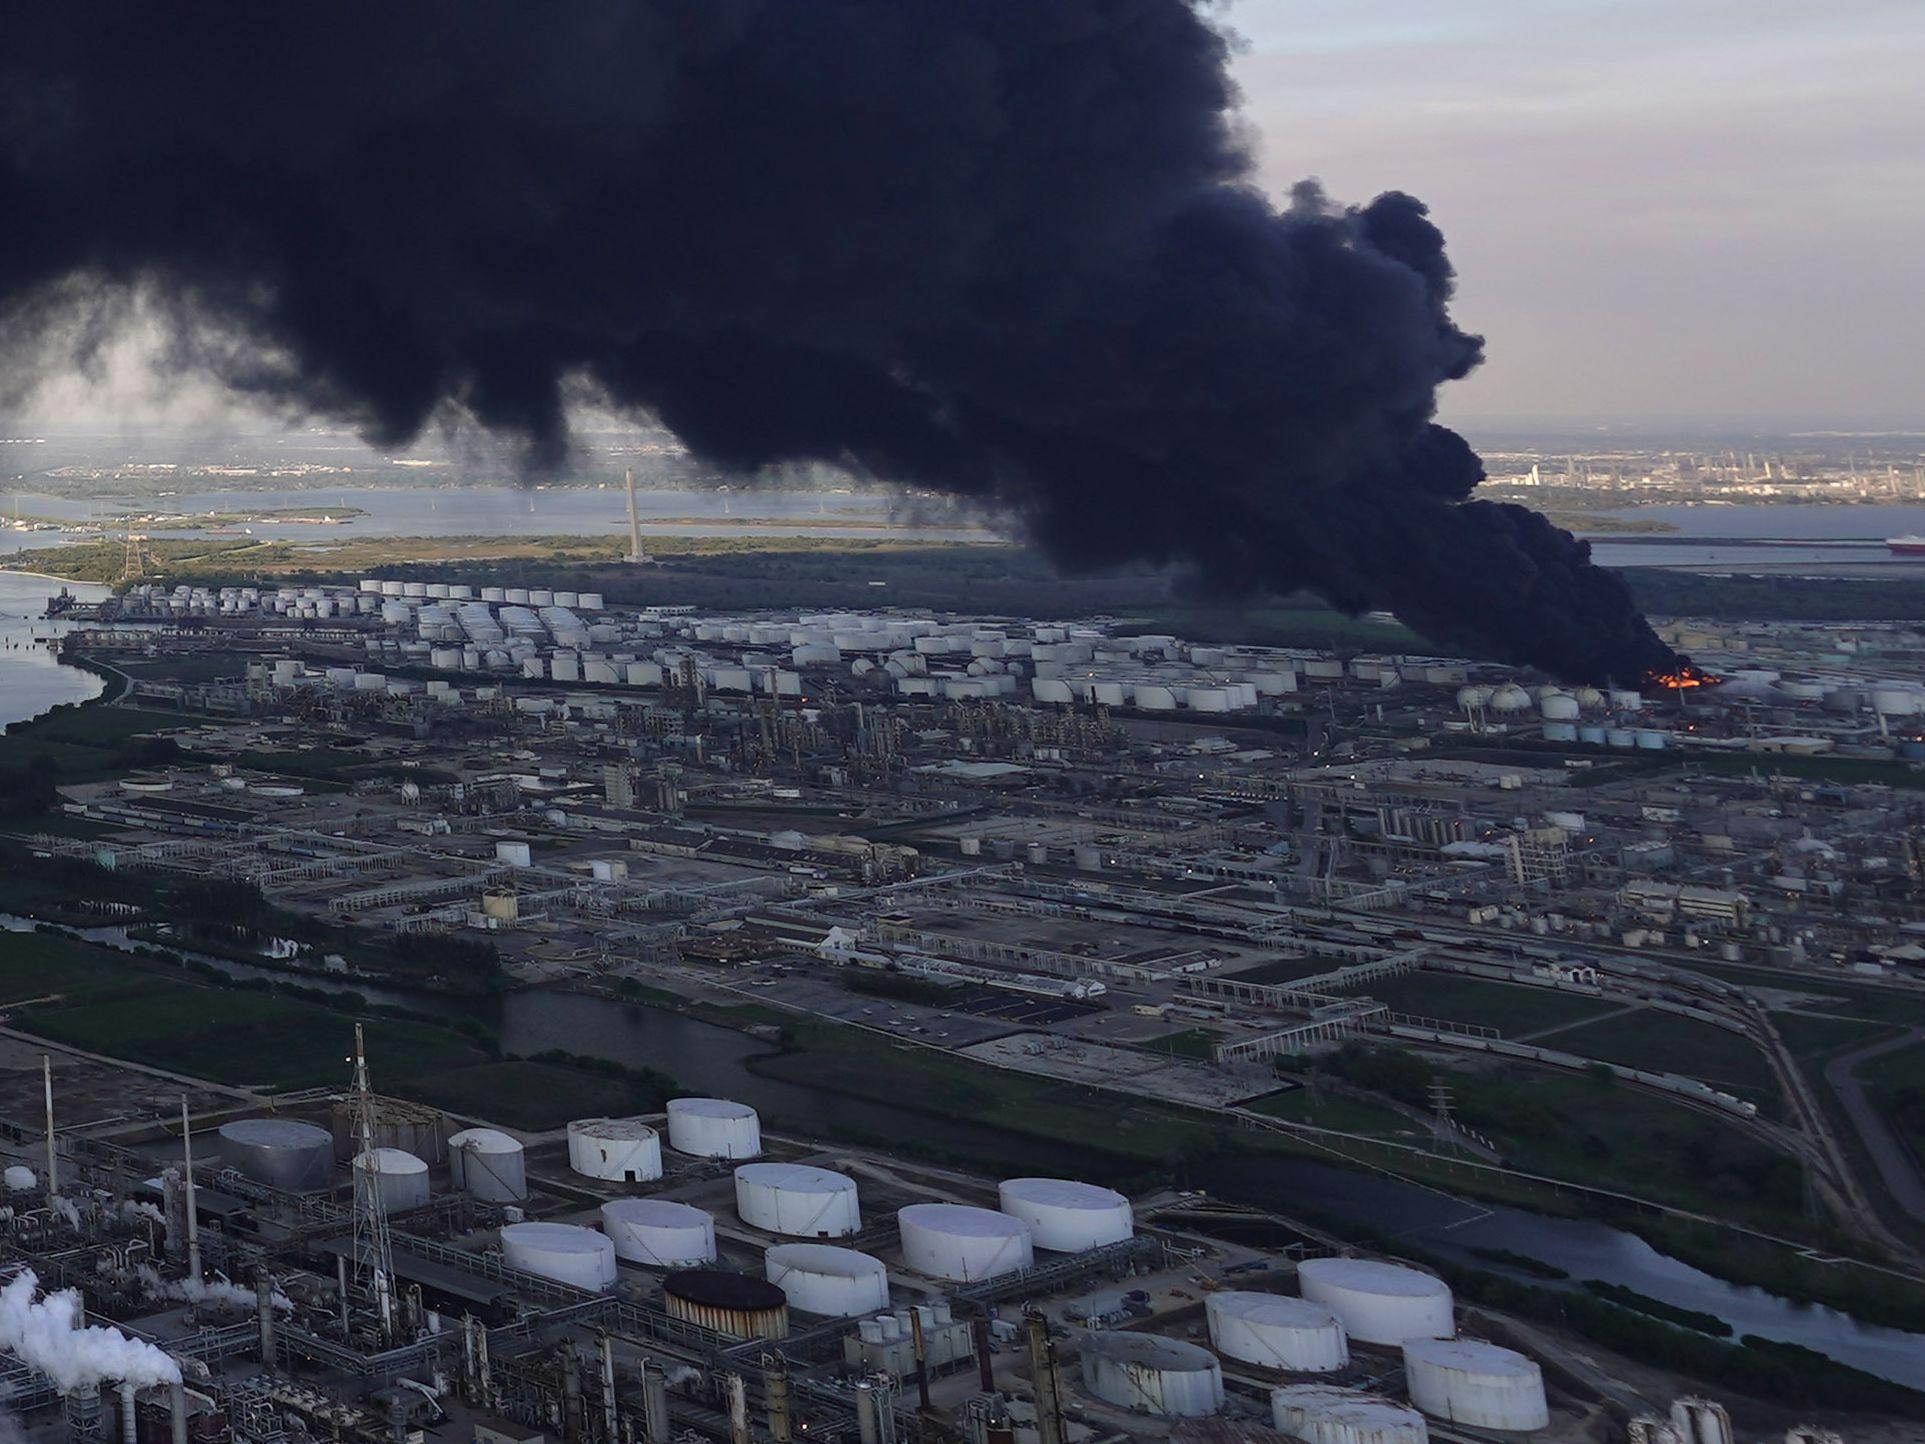 Blaze extinguished at Texas petrochemicals facility